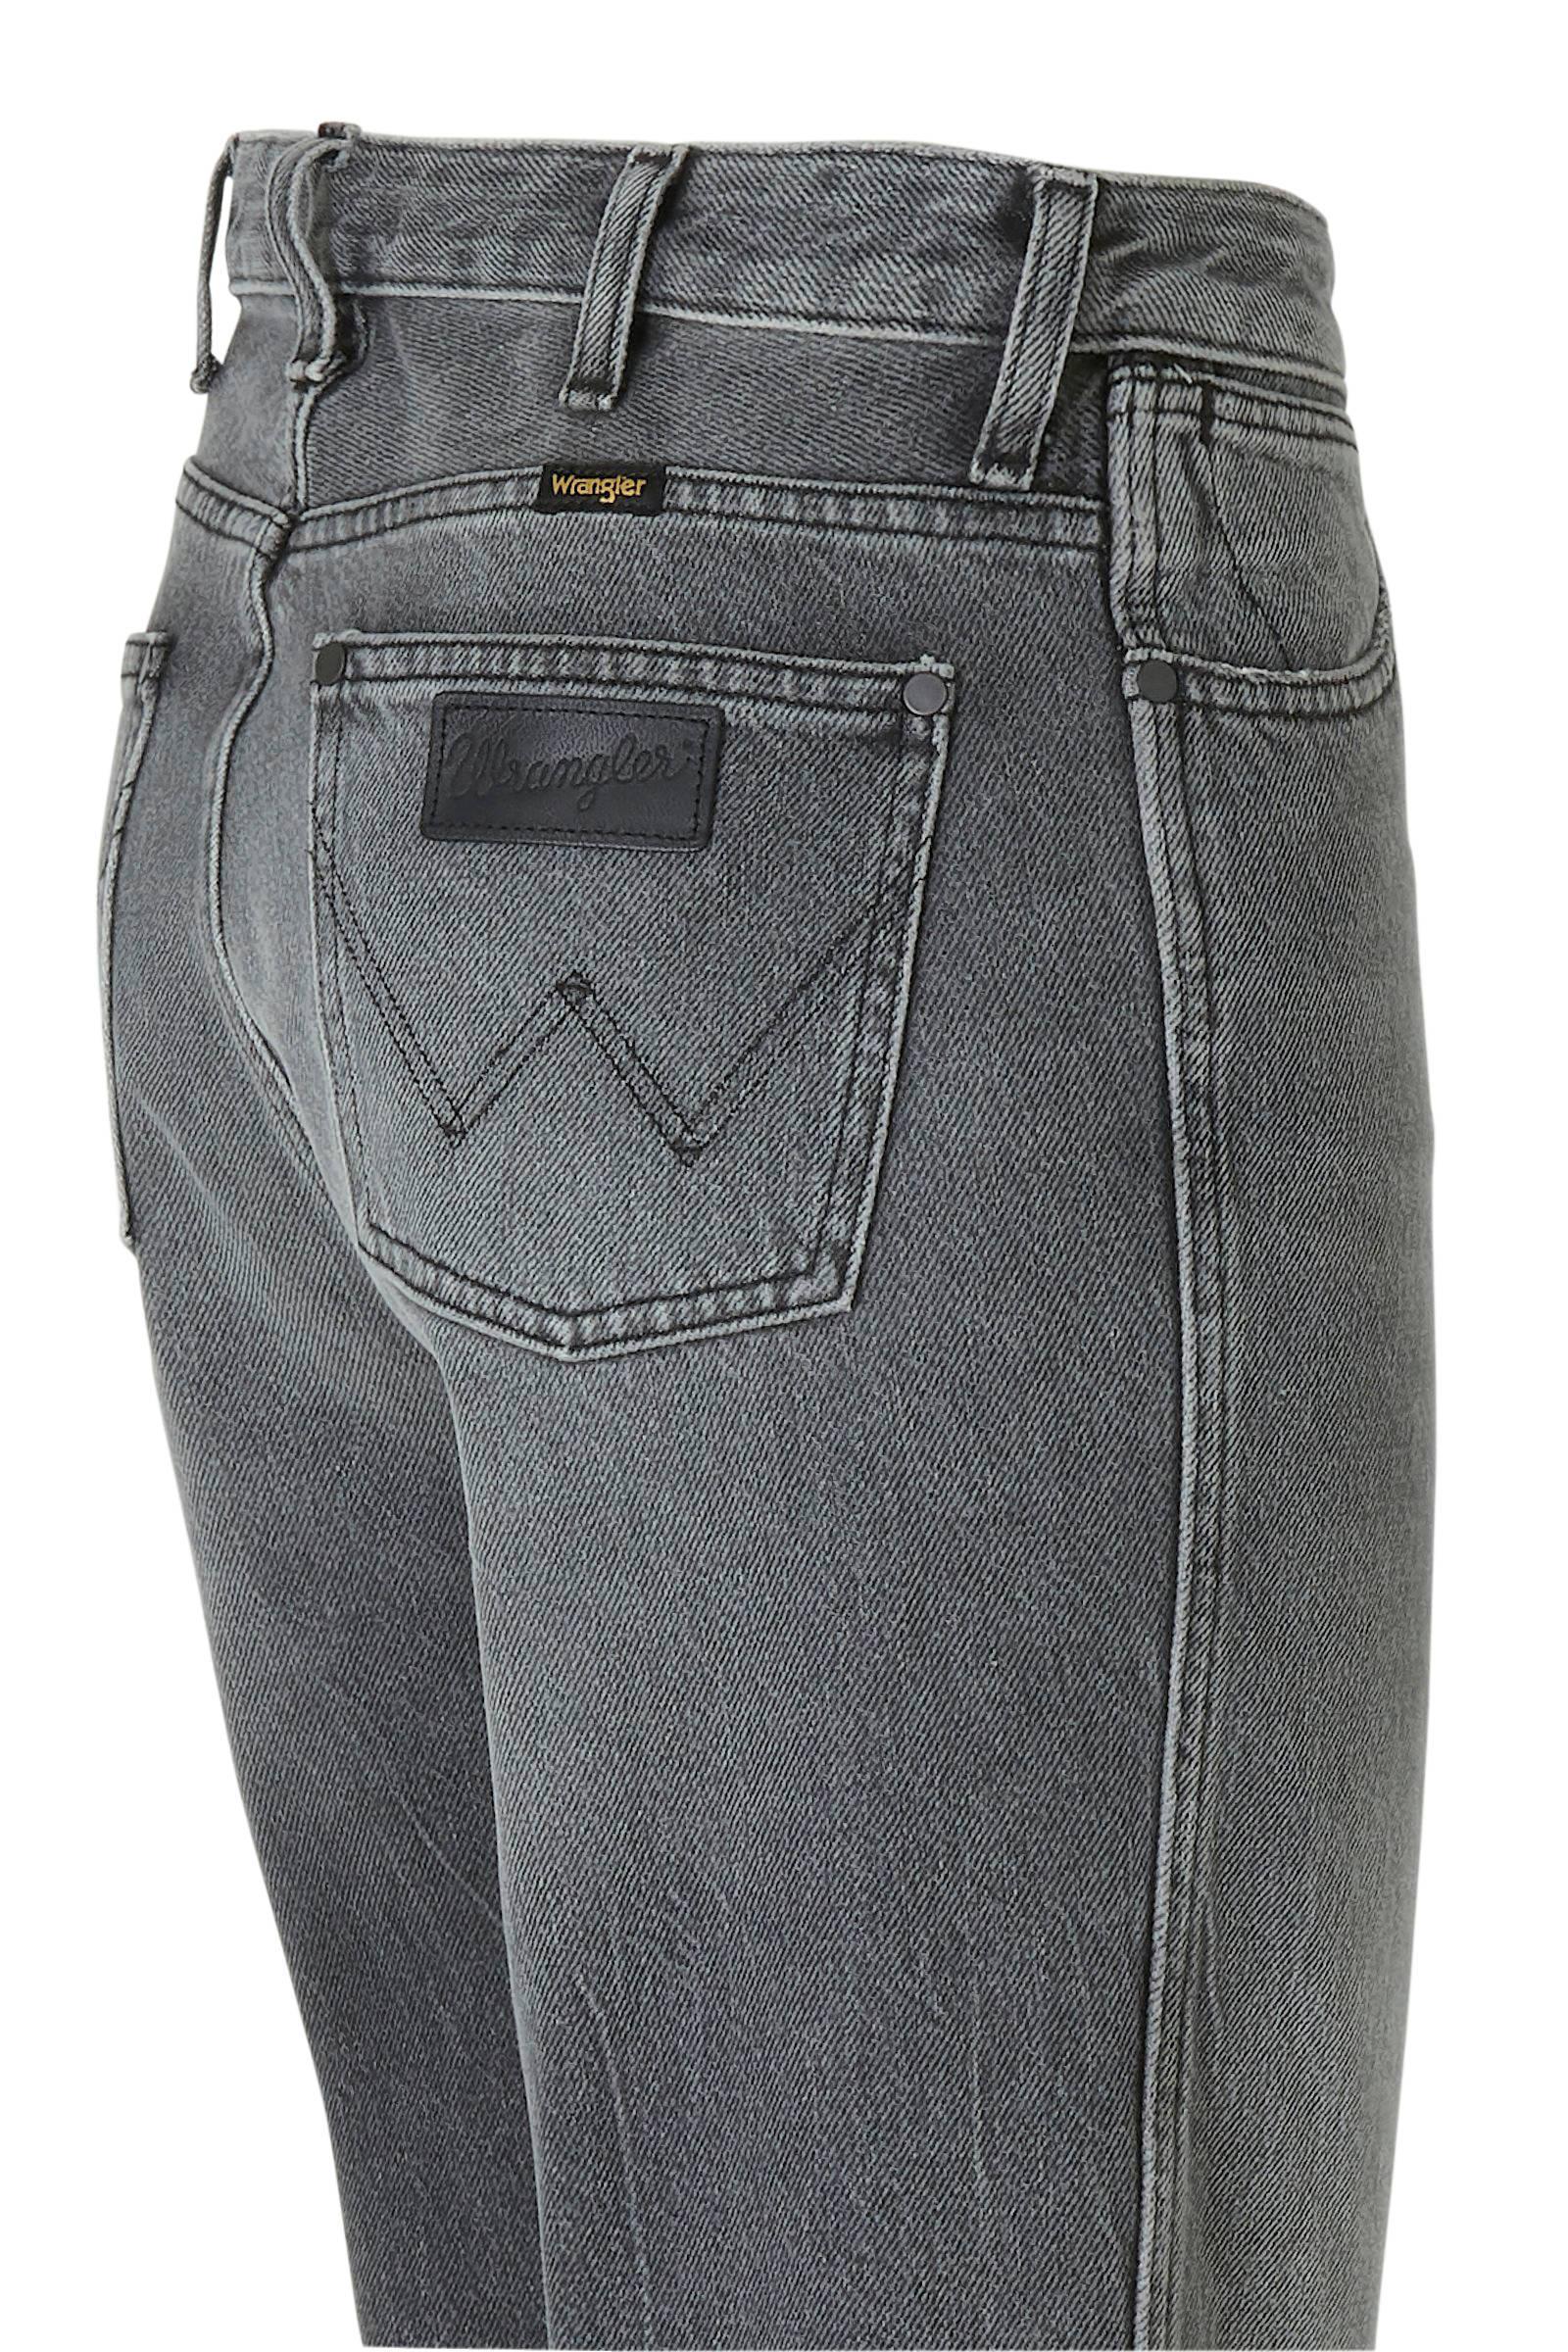 Wrangler high waist loose fit jeans grijs